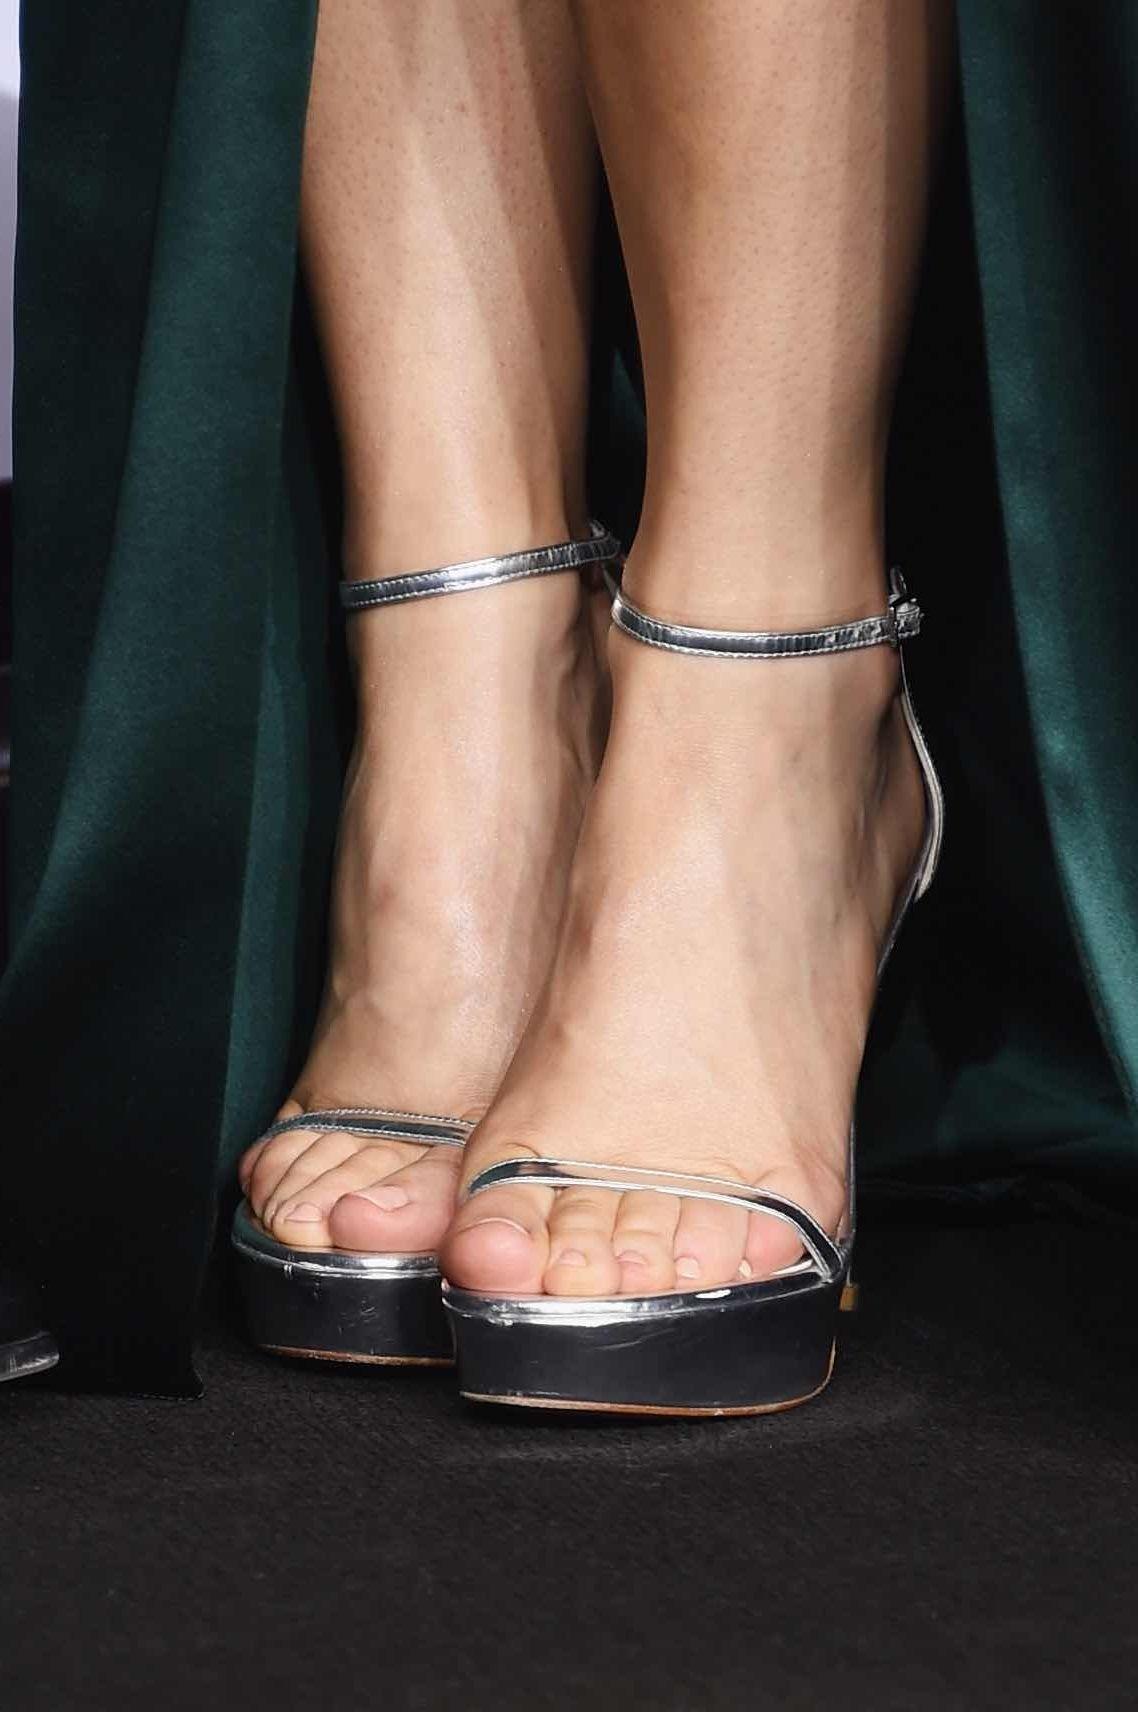 cameltoe Feet Rachel McAdams naked photo 2017